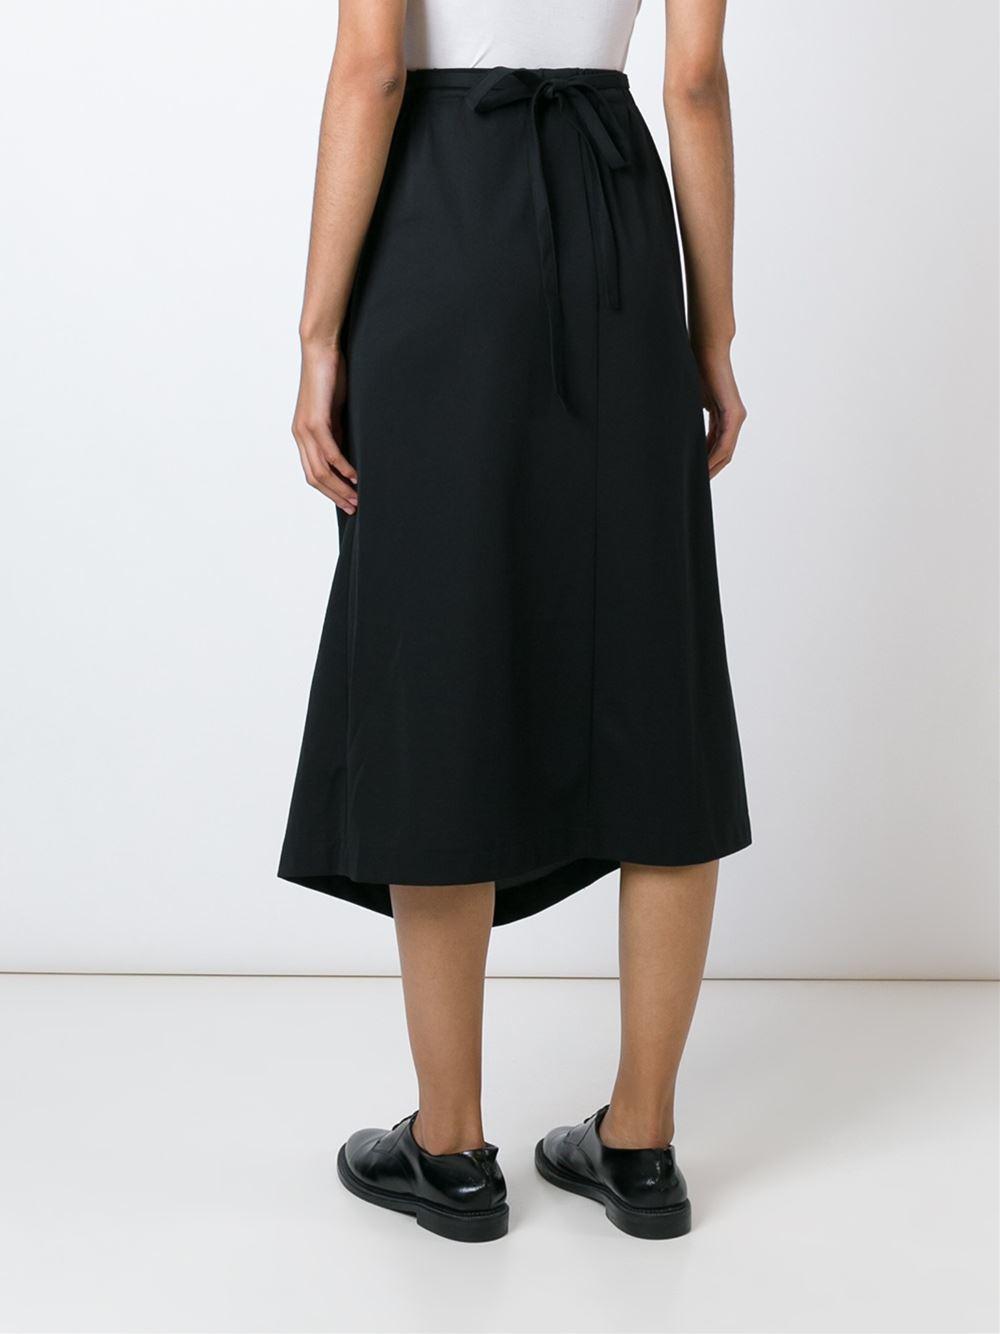 Apron Skirt 97